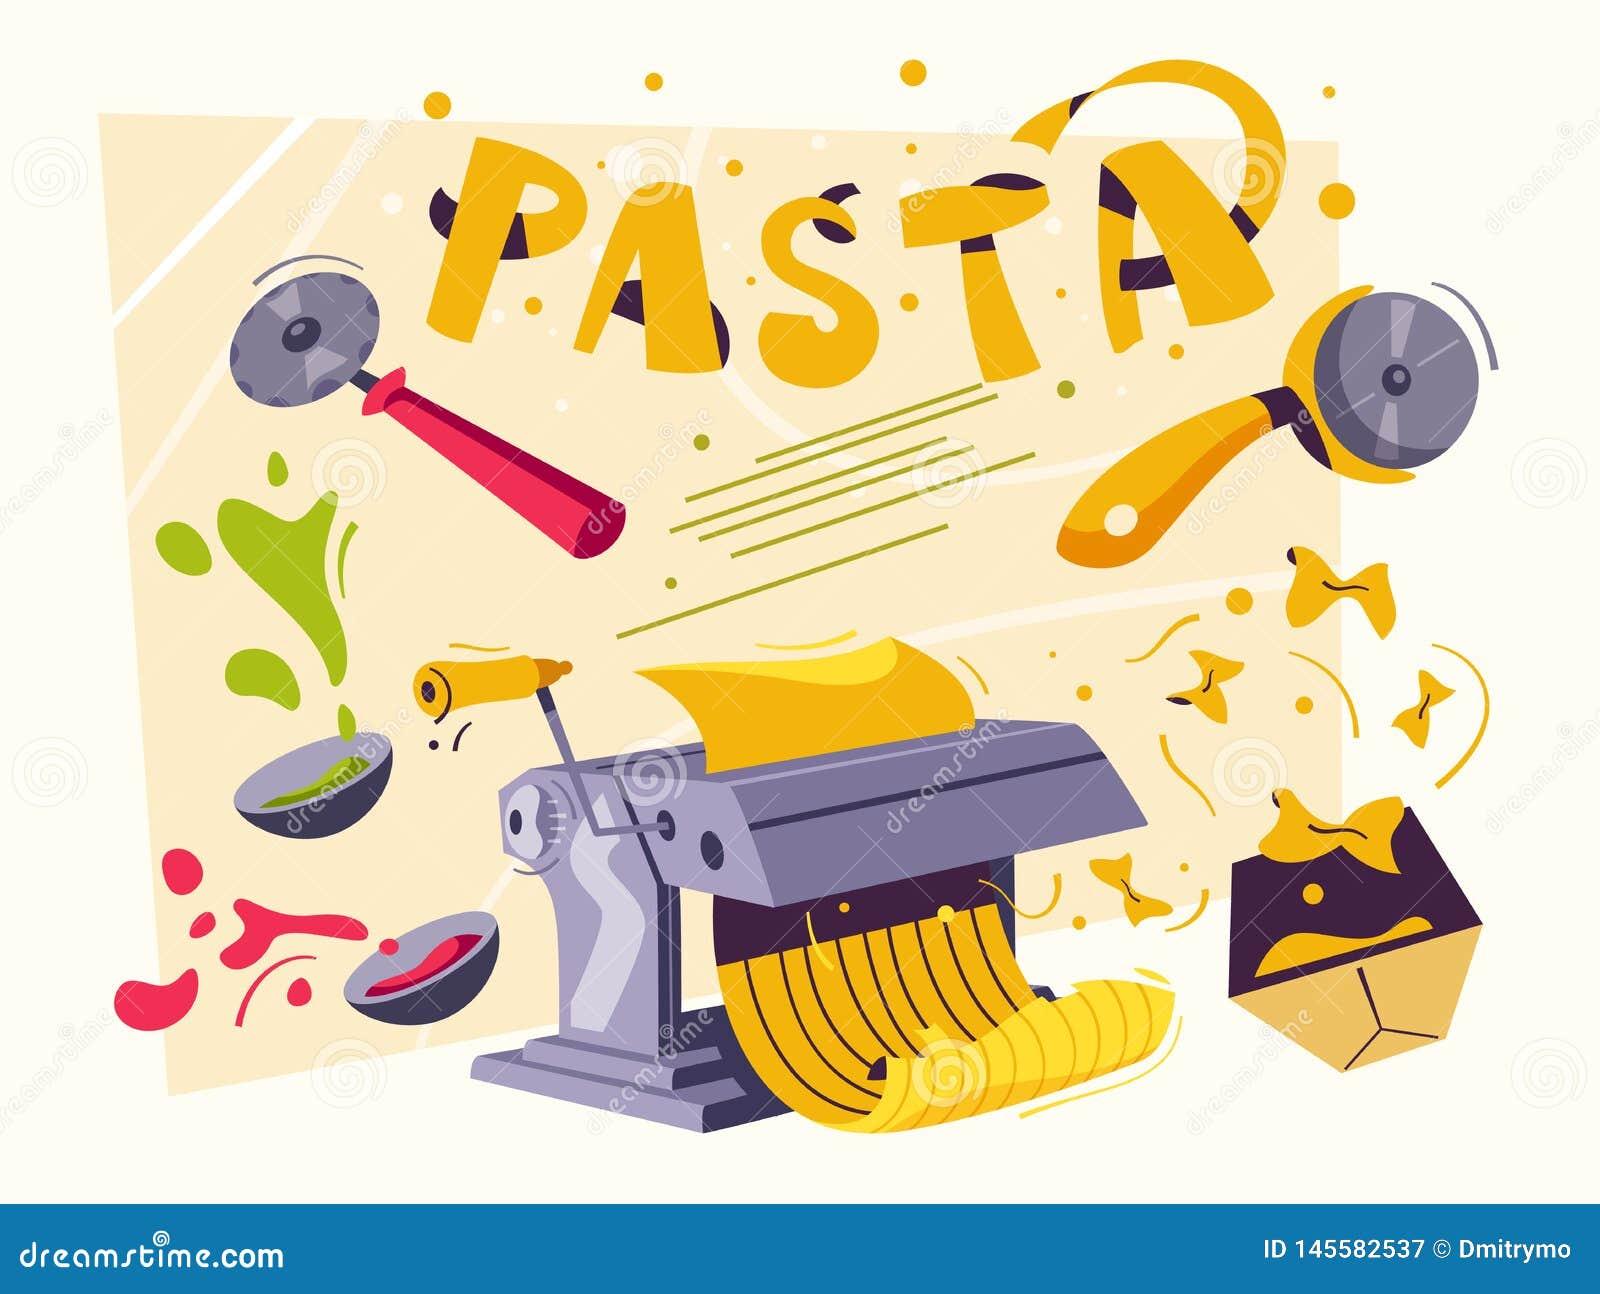 Italian food. Making delicious pasta. Cartoon vector illustration.